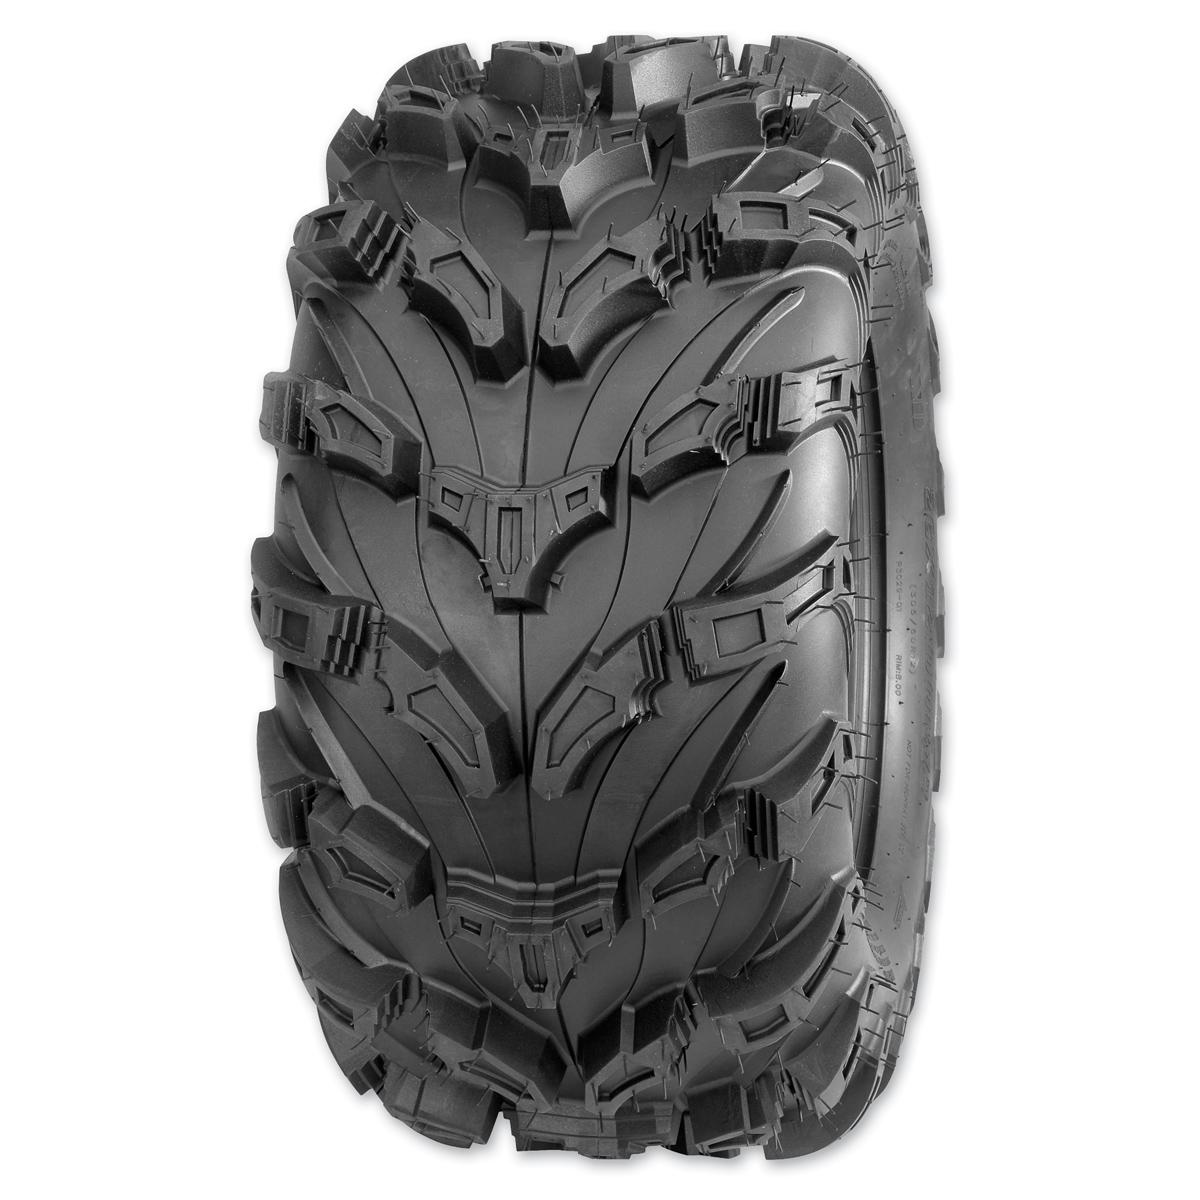 Quadboss QBT672 27X11R14 8-Ply Rear Tire